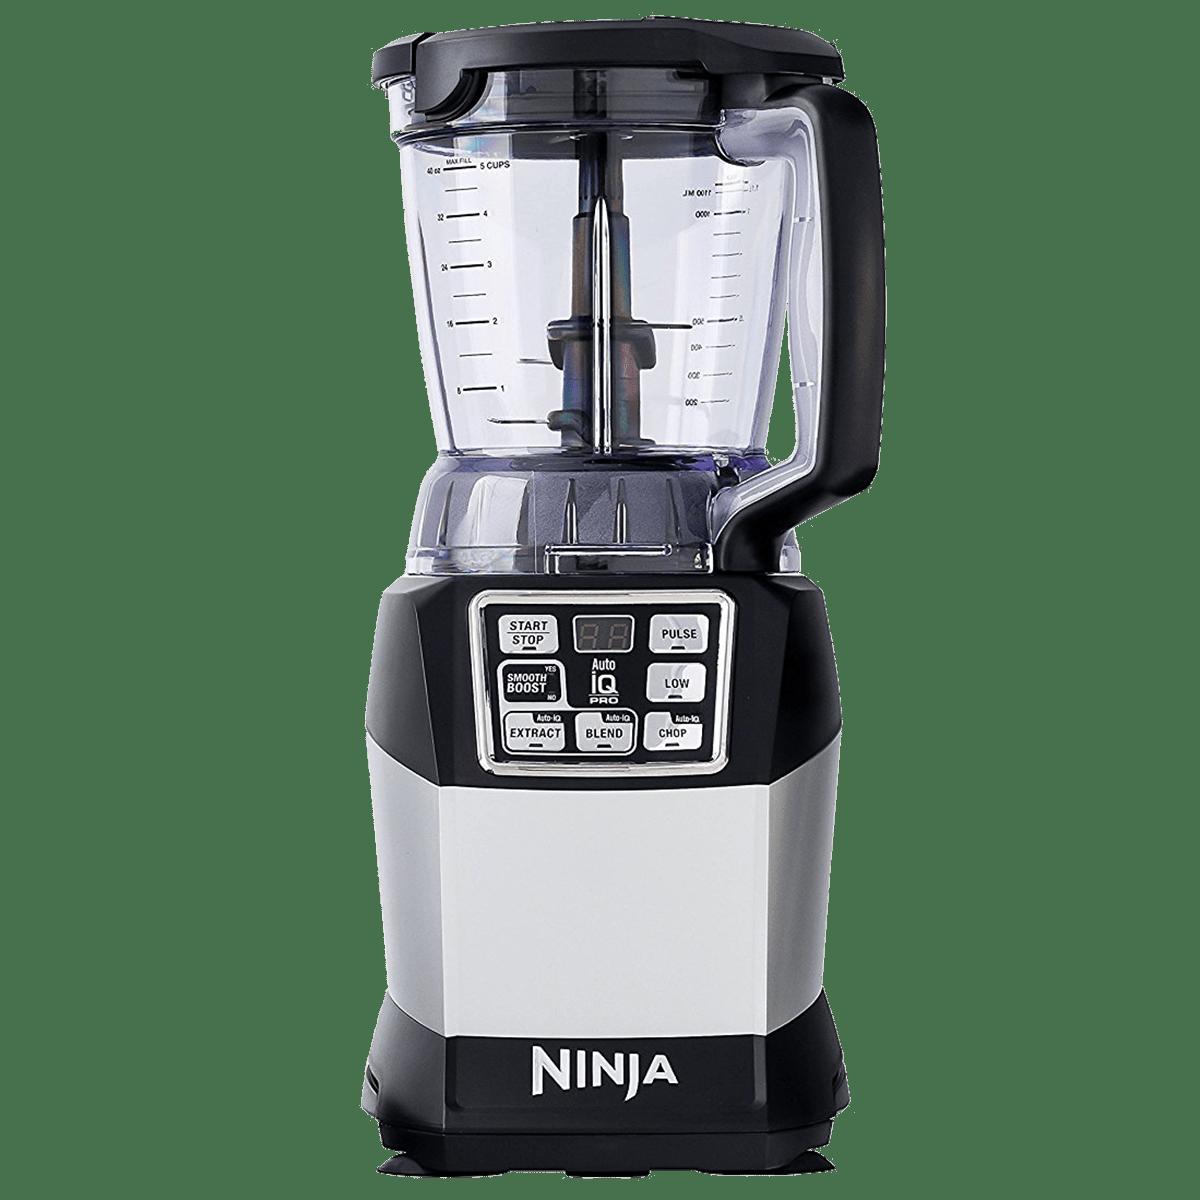 ninja auto iq owners manual